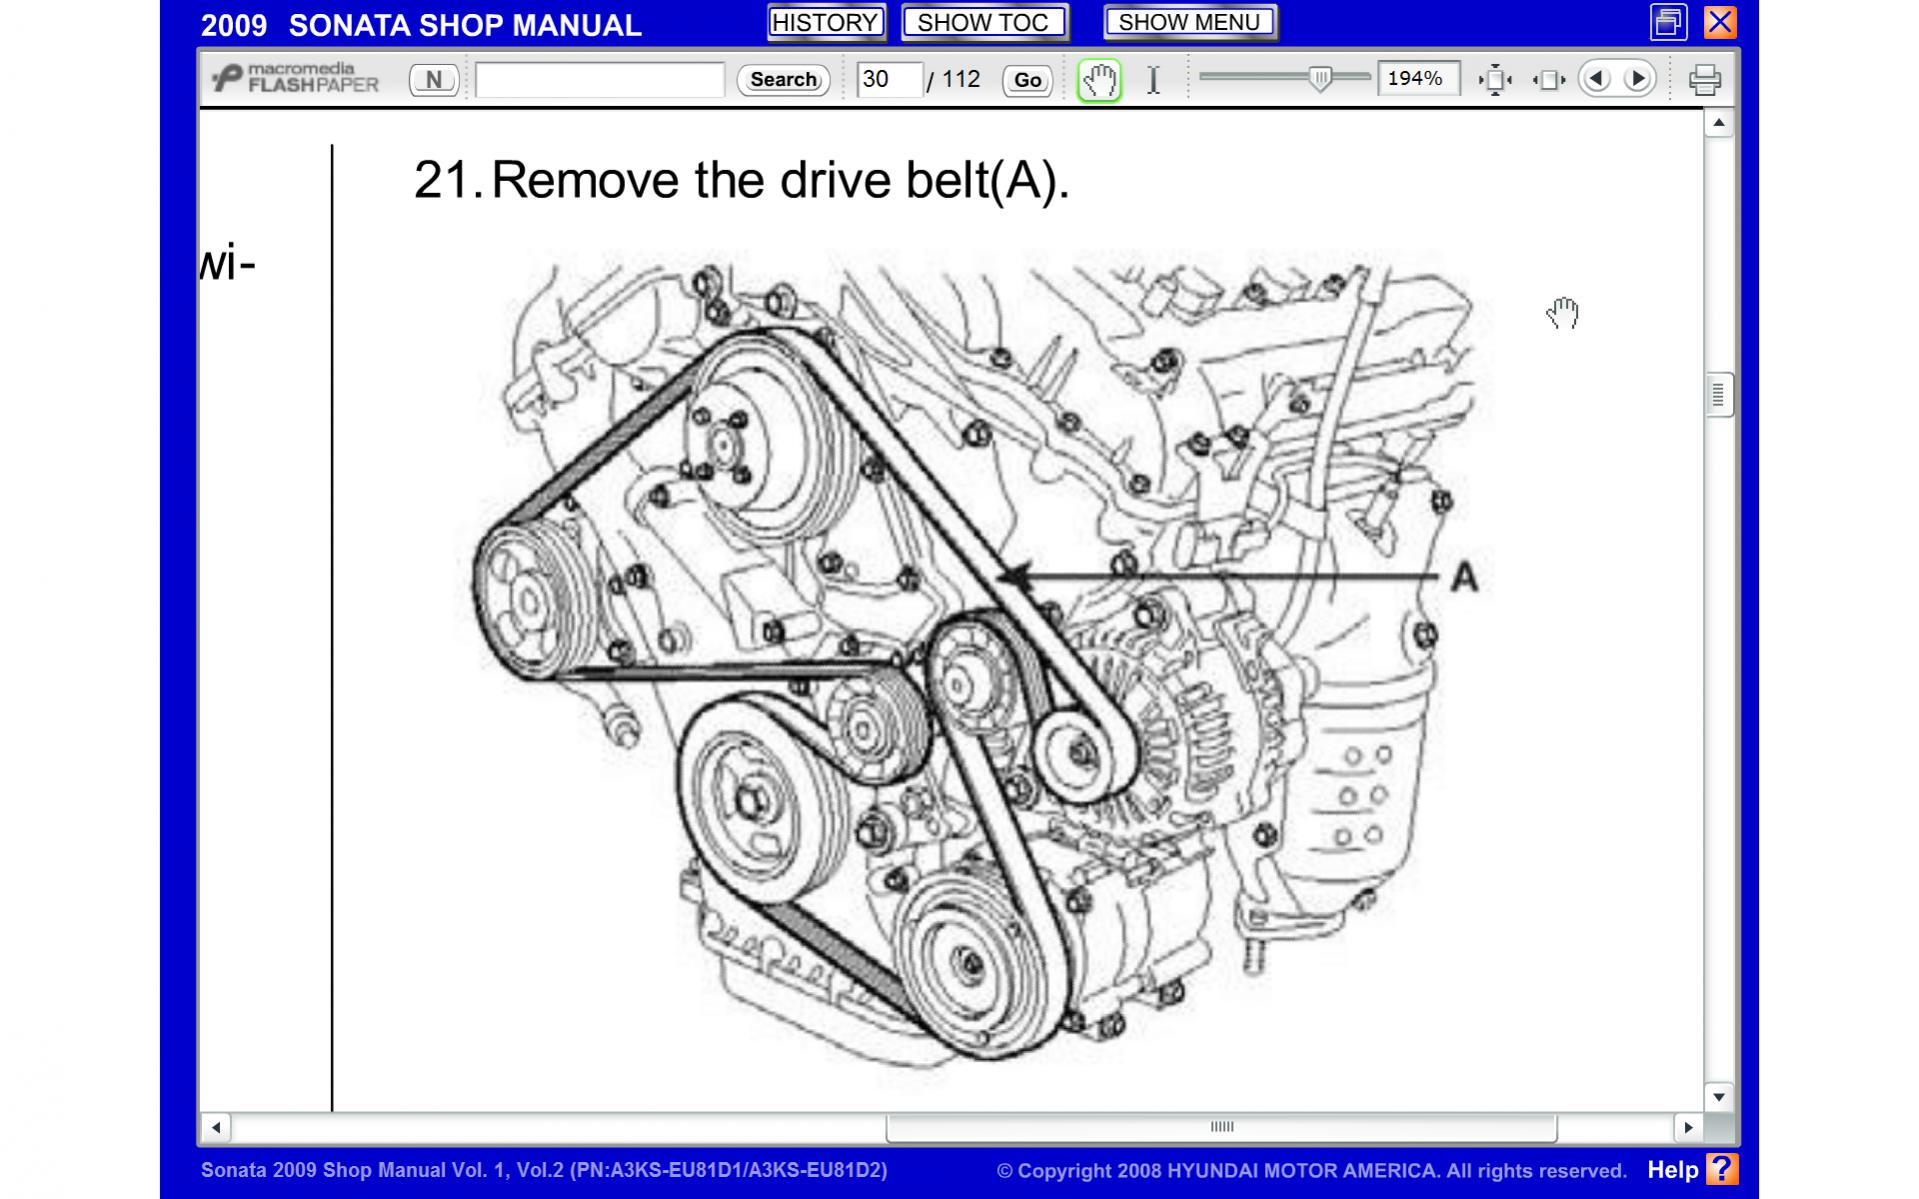 2009 Sonota serpentine belt diagram | Hyundai ForumsHyundai Forums